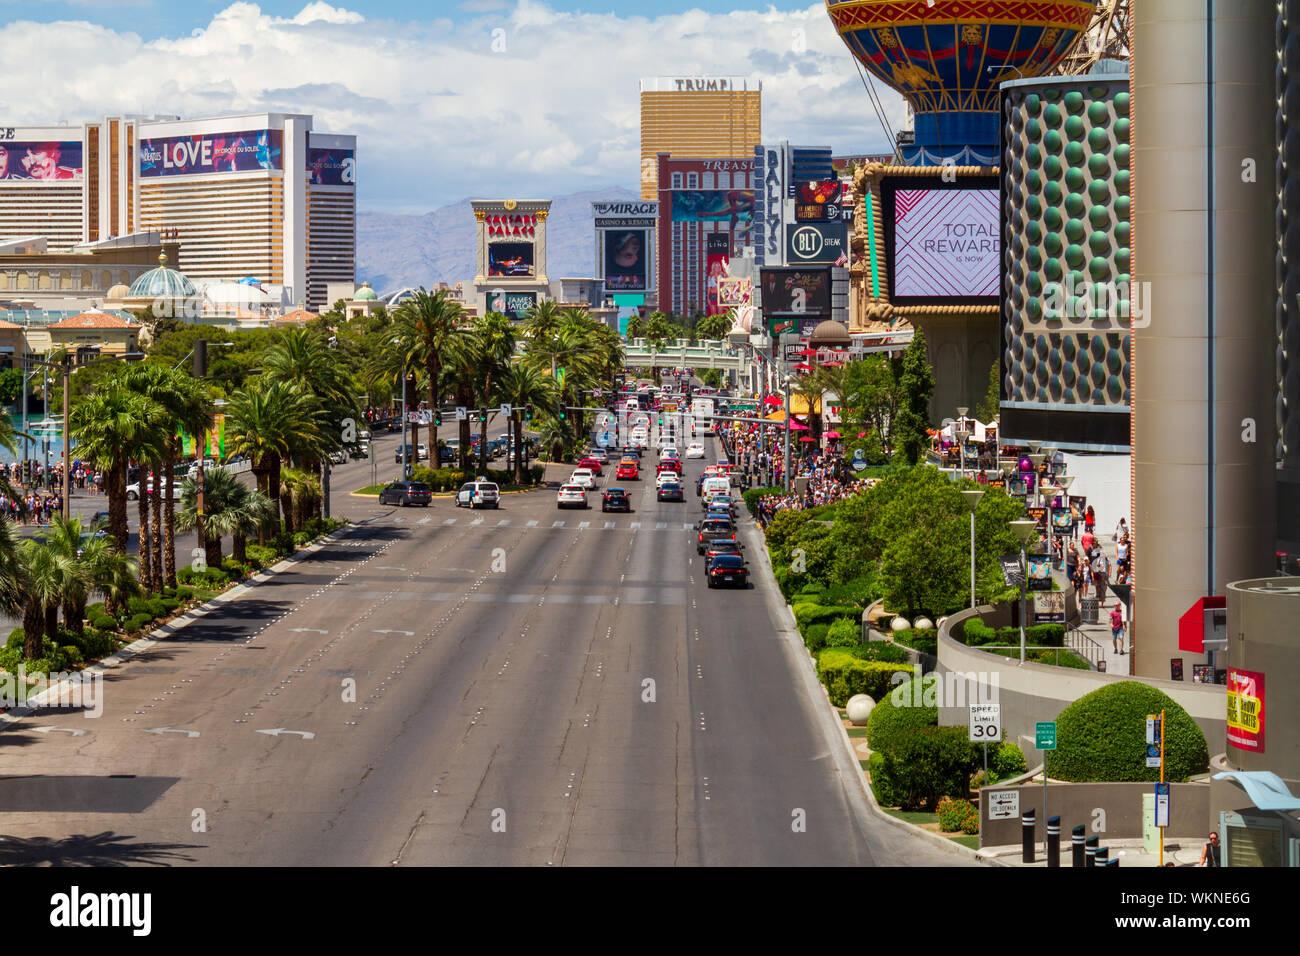 Las Vegas, Nevada / USA – May 11, 2019: Heavy traffic and crowds of people on Las Vegas Blvd in Las Vegas, Nevada. Stock Photo